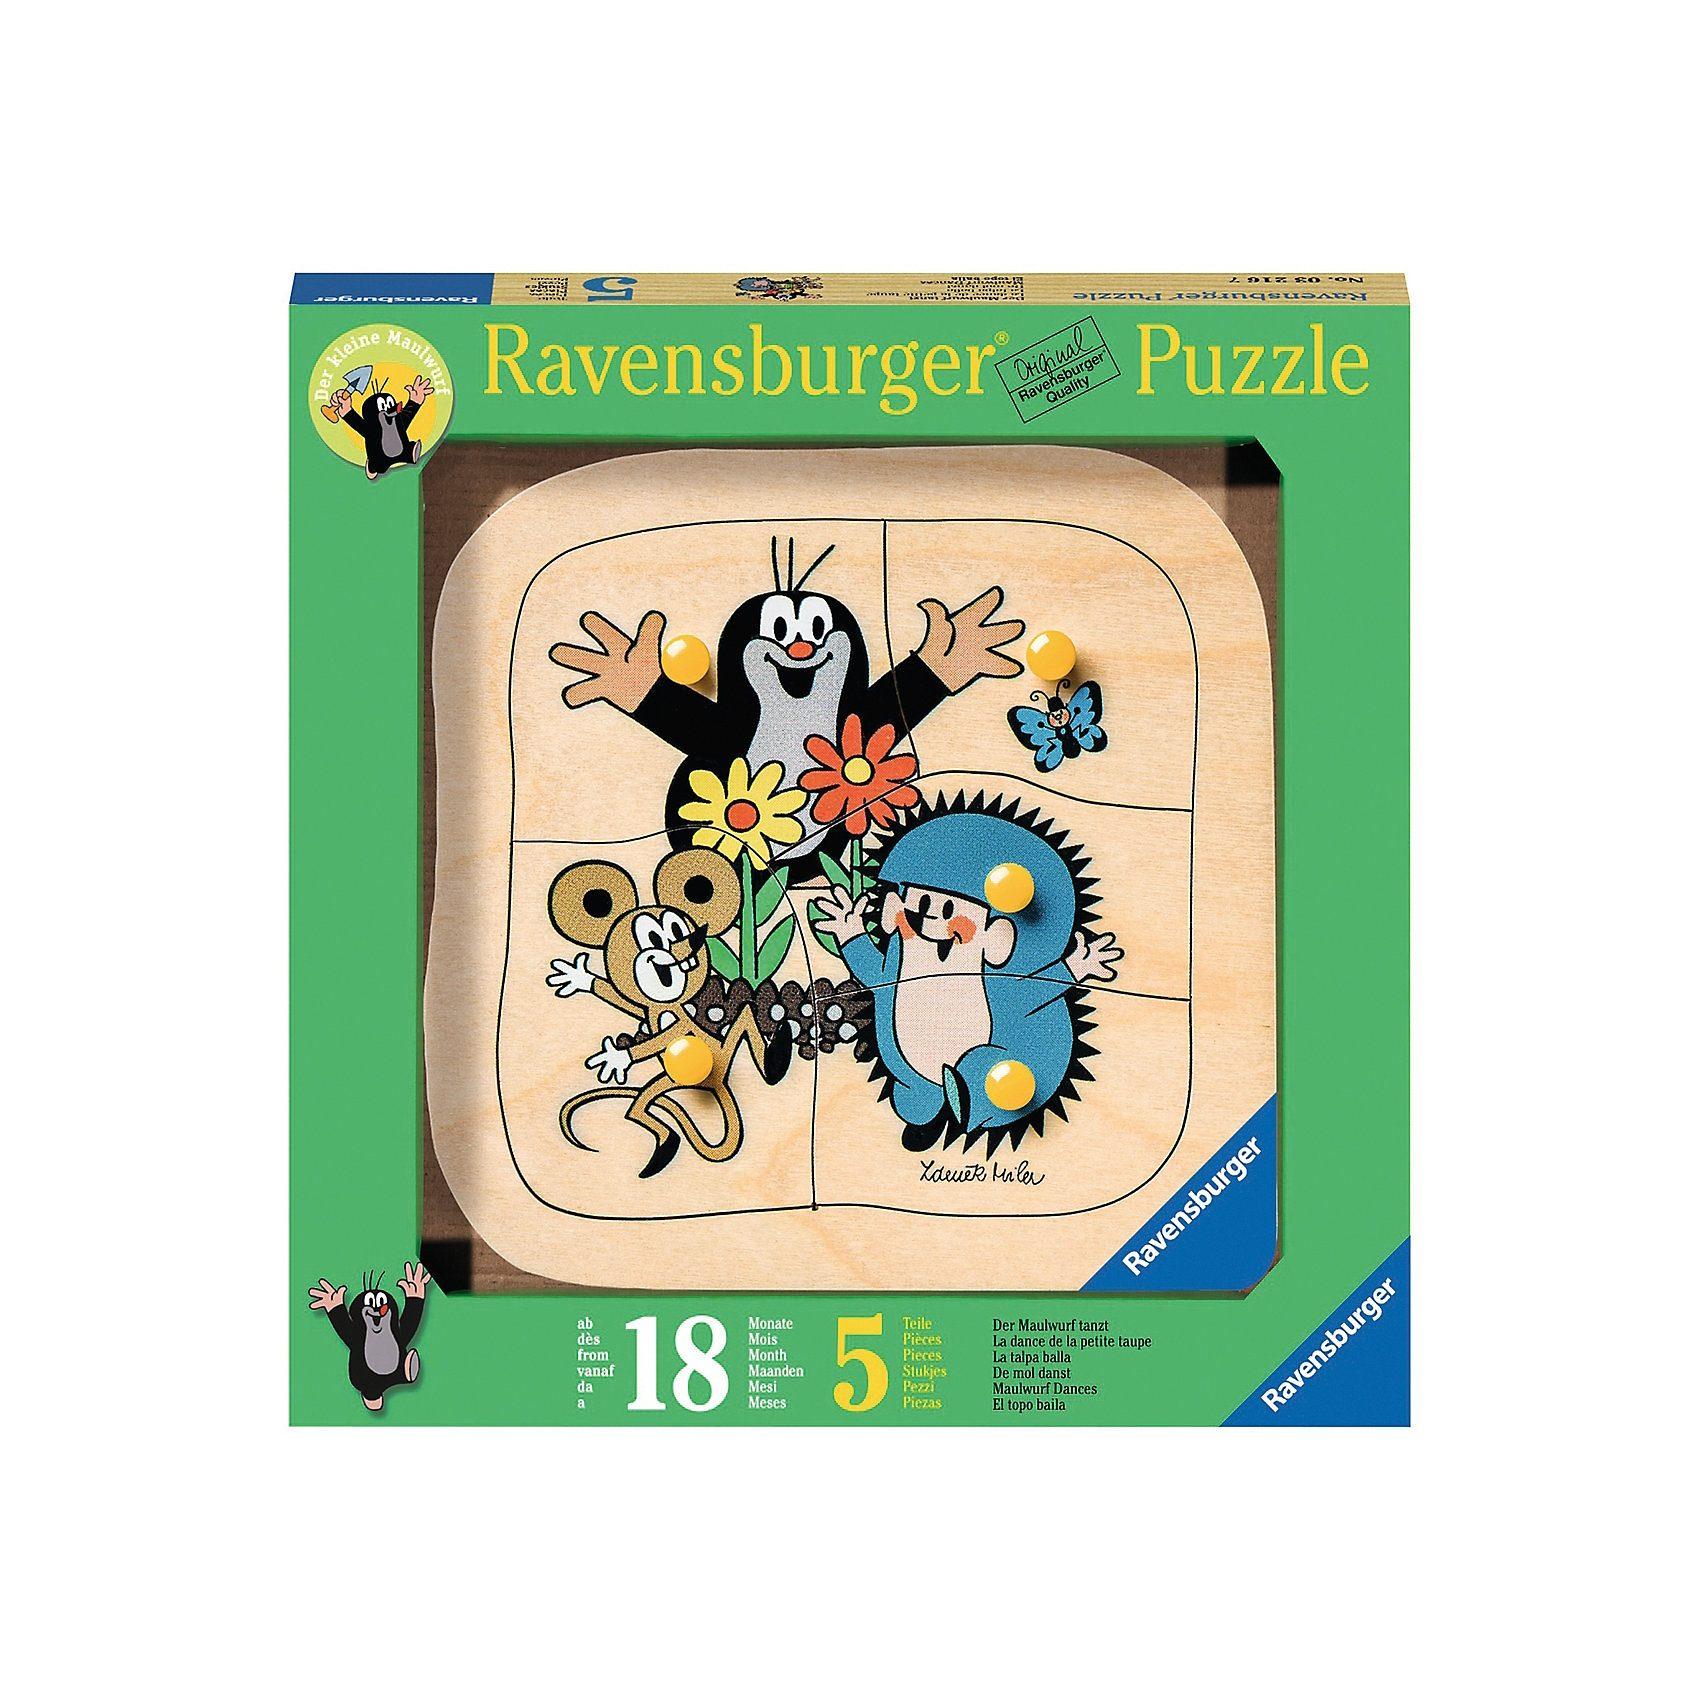 Ravensburger 5 Teile Konturholzpuzzle Der Maulwurf tanzt